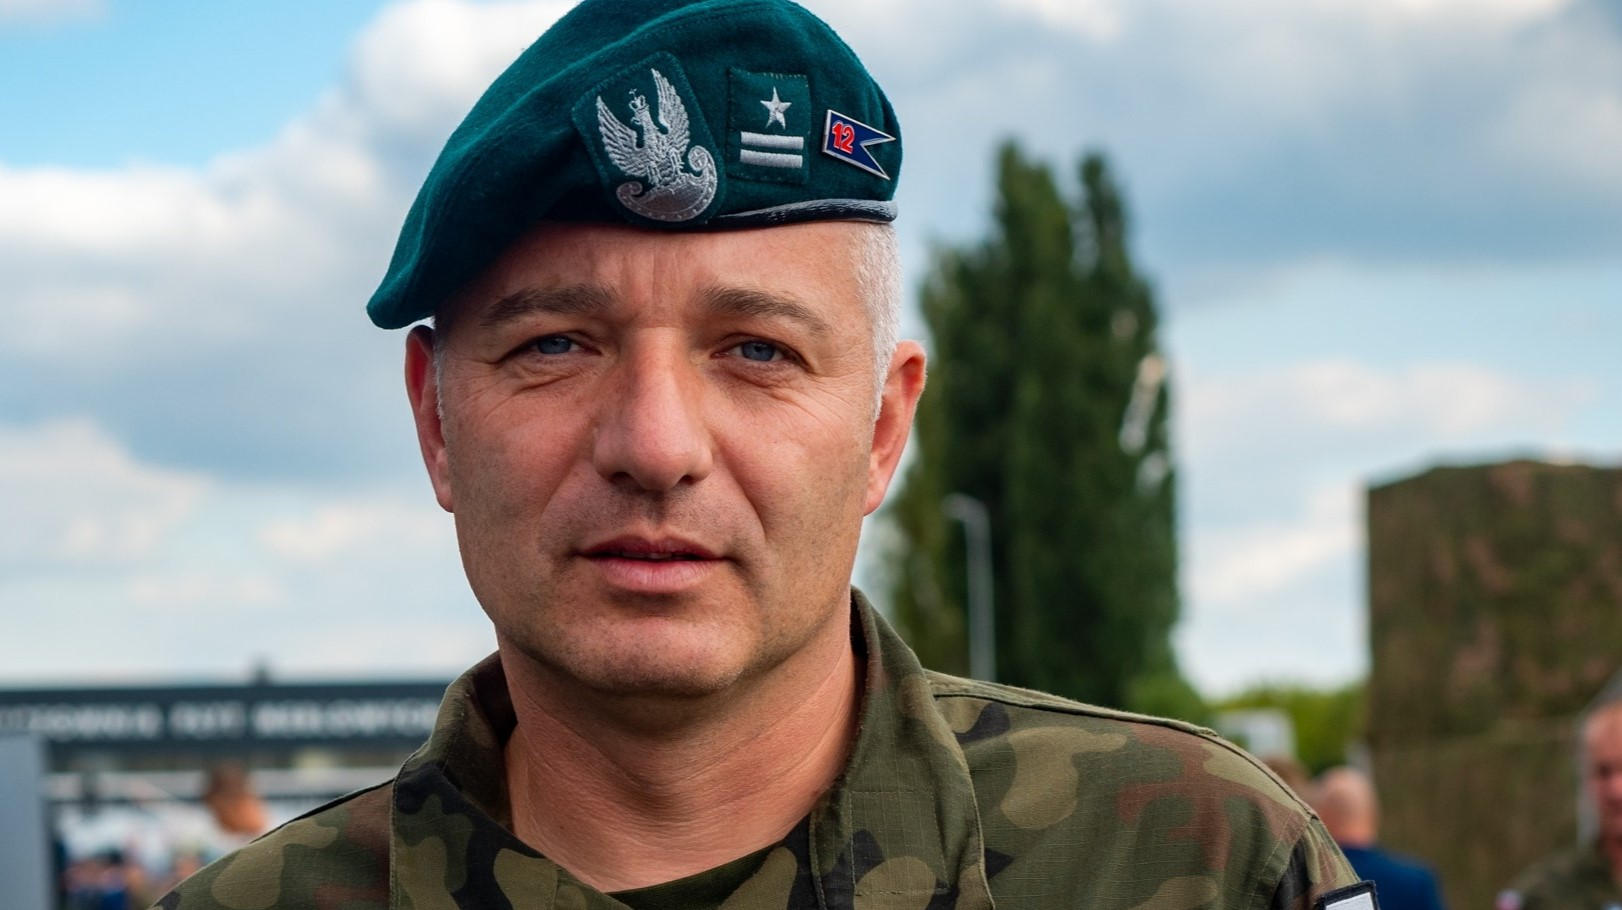 Major Marcel Podhorodecki - Archiwum prywatne